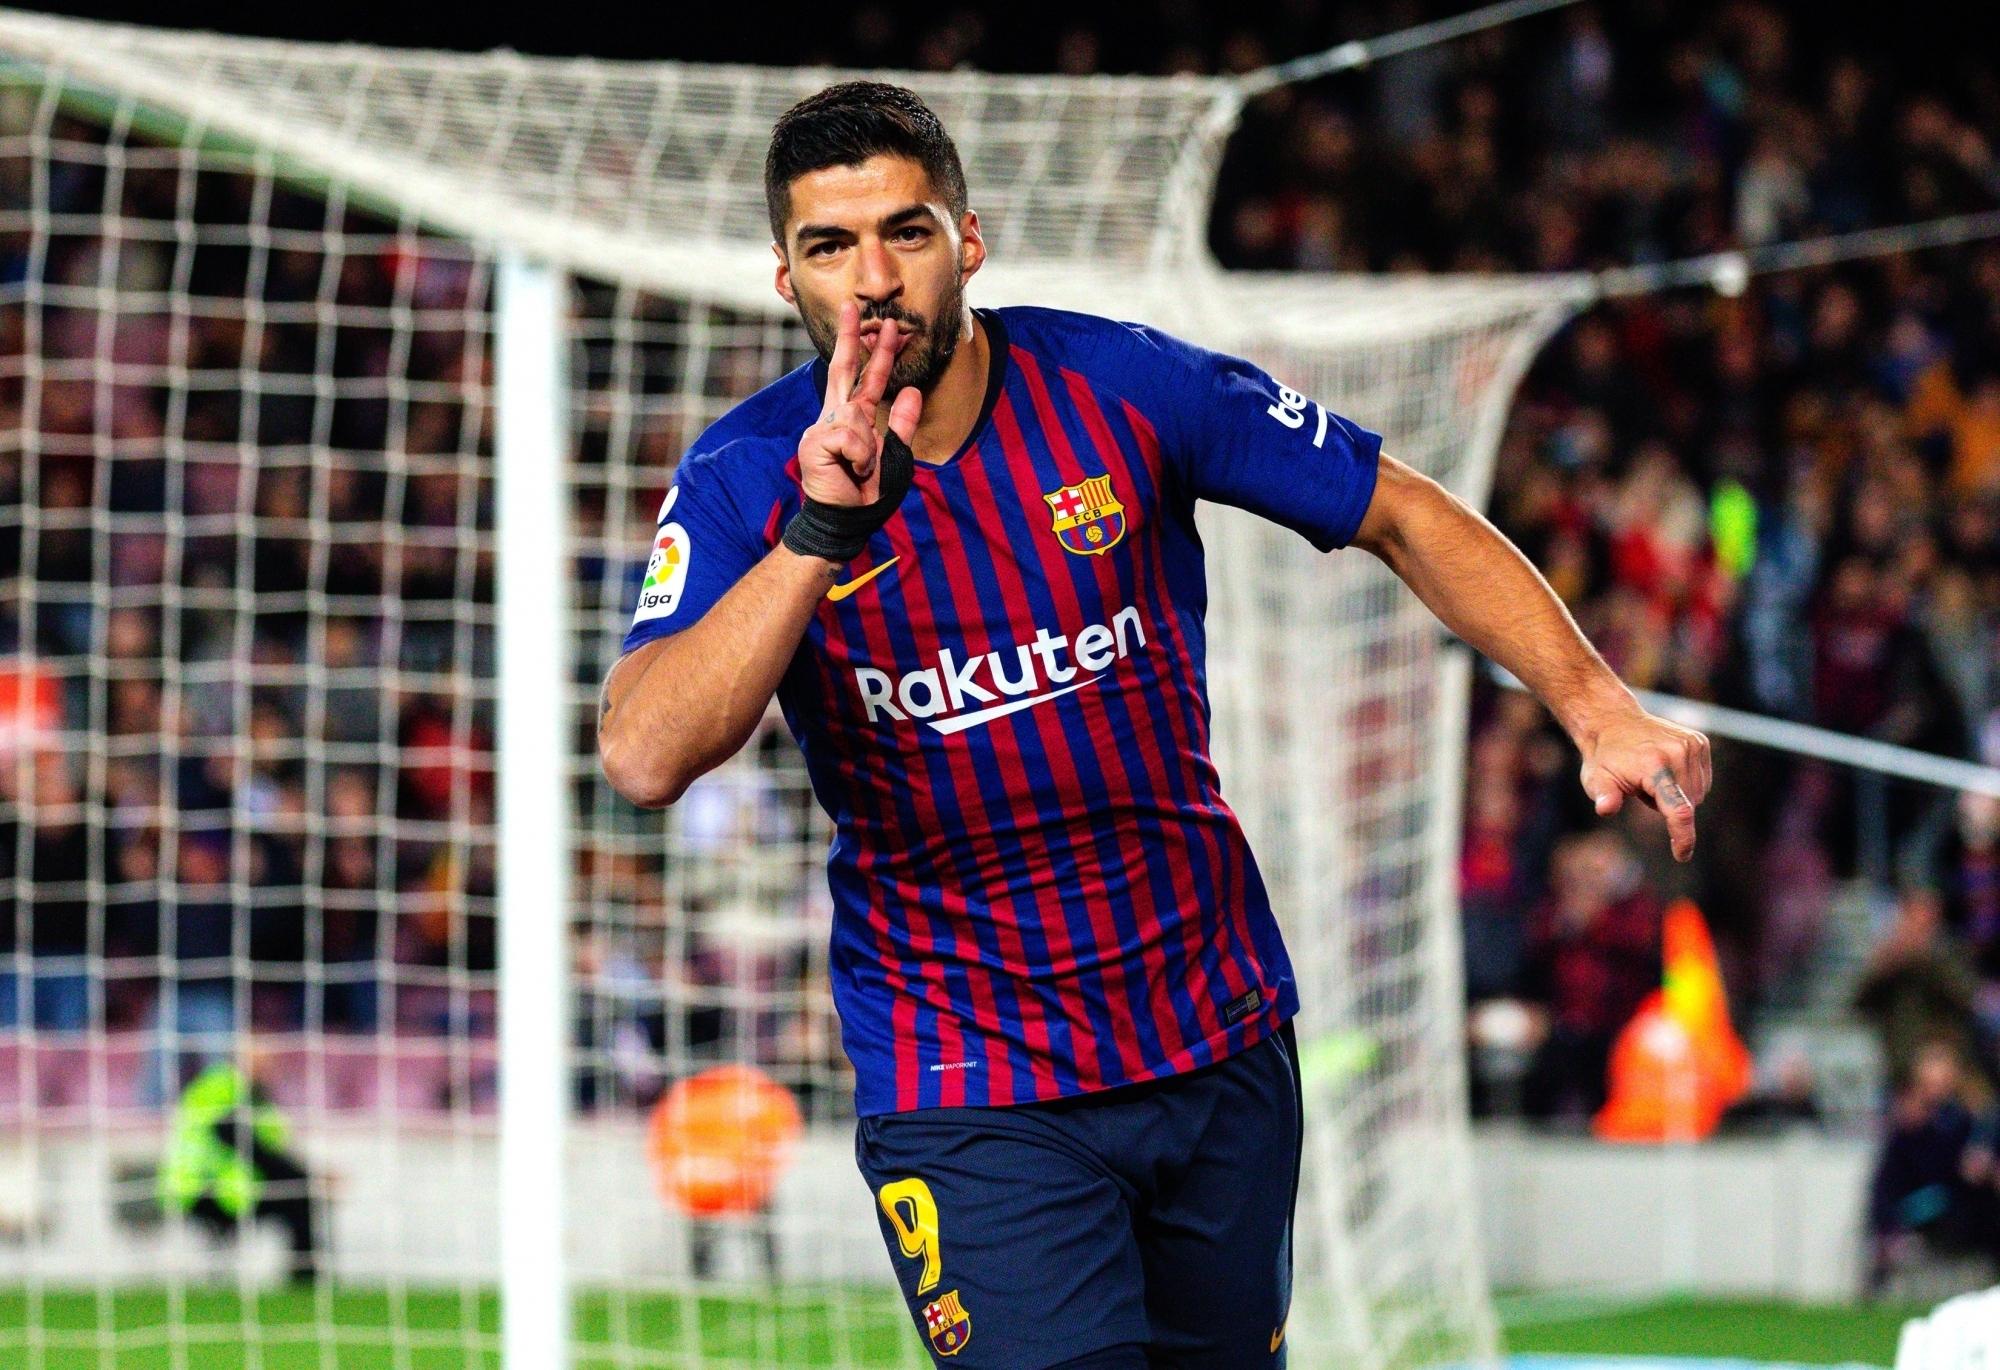 Soccer-La Liga set for close-run race after Barca, Real, Atletico transfer blitz